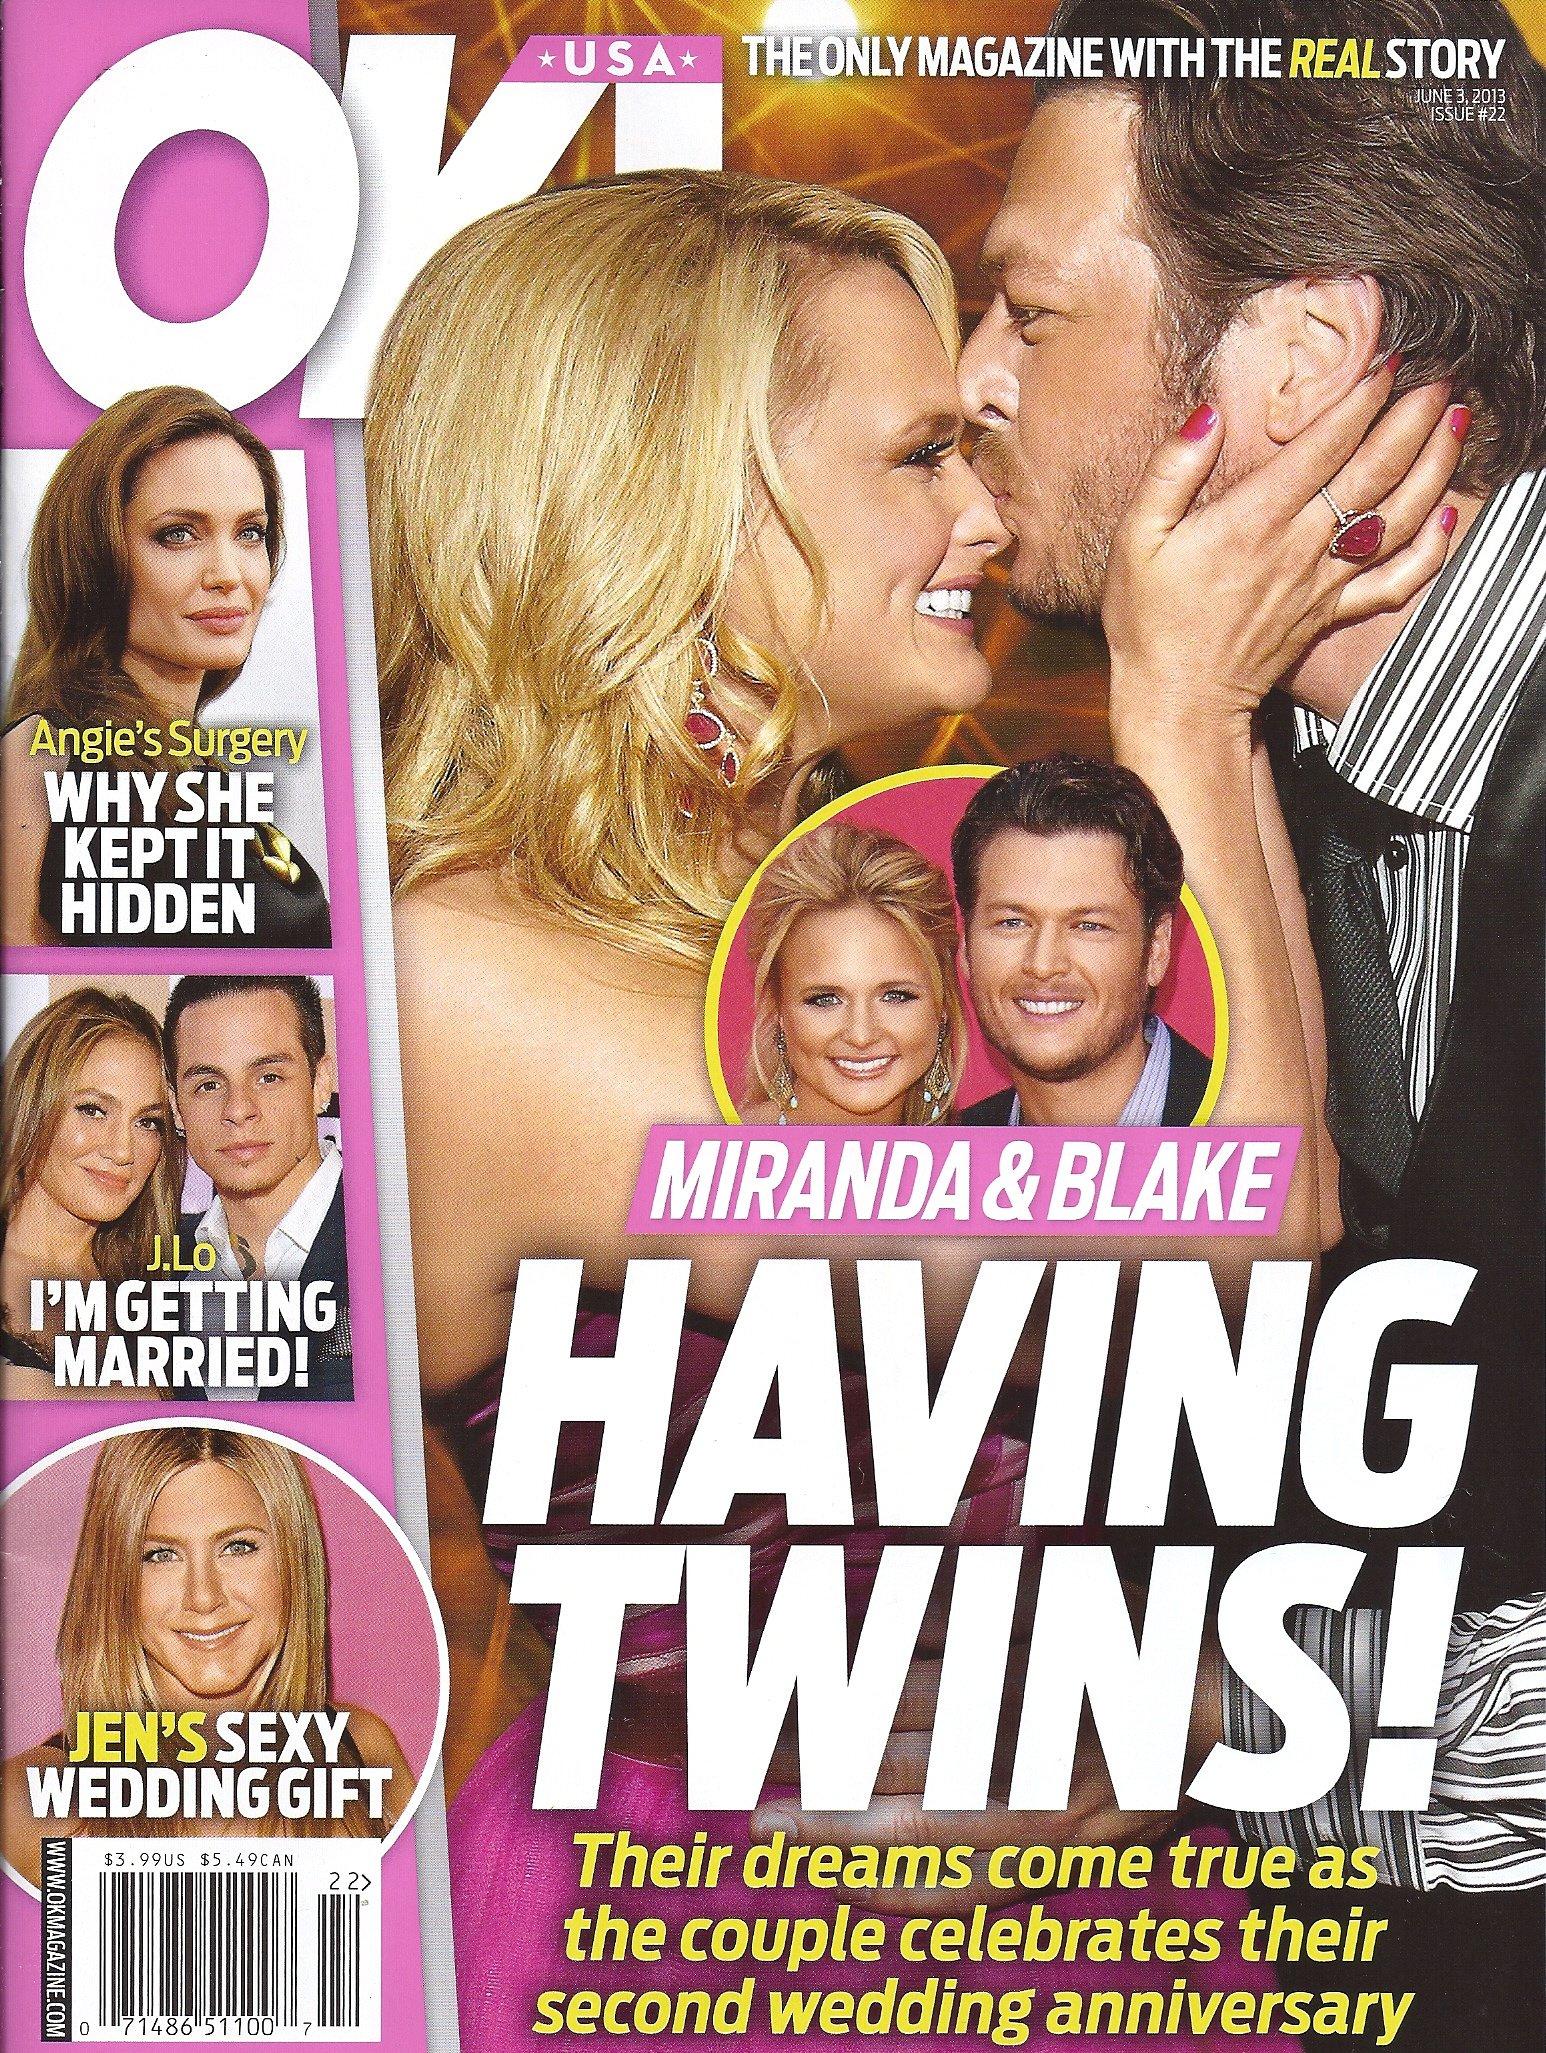 Miranda Lambert, Blake Shelton, Angelina Jolie, Jennifer Lopez Aniston - June 3, 2013 OK! Magazine ebook